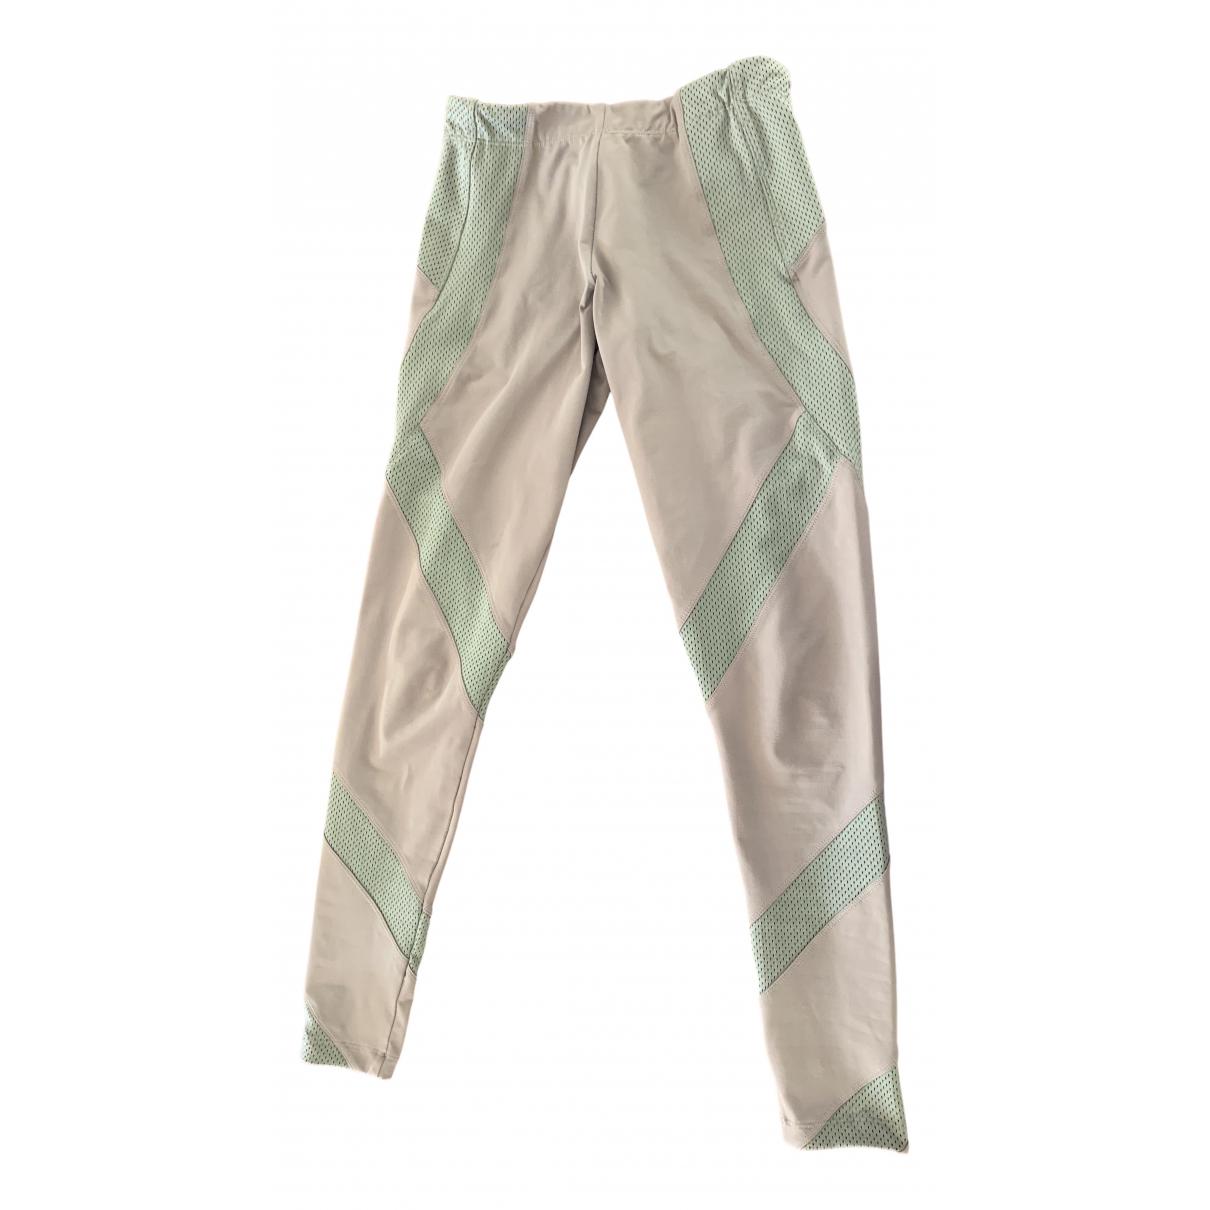 Stella Mccartney Pour Adidas N Beige Spandex Trousers for Women 36 FR